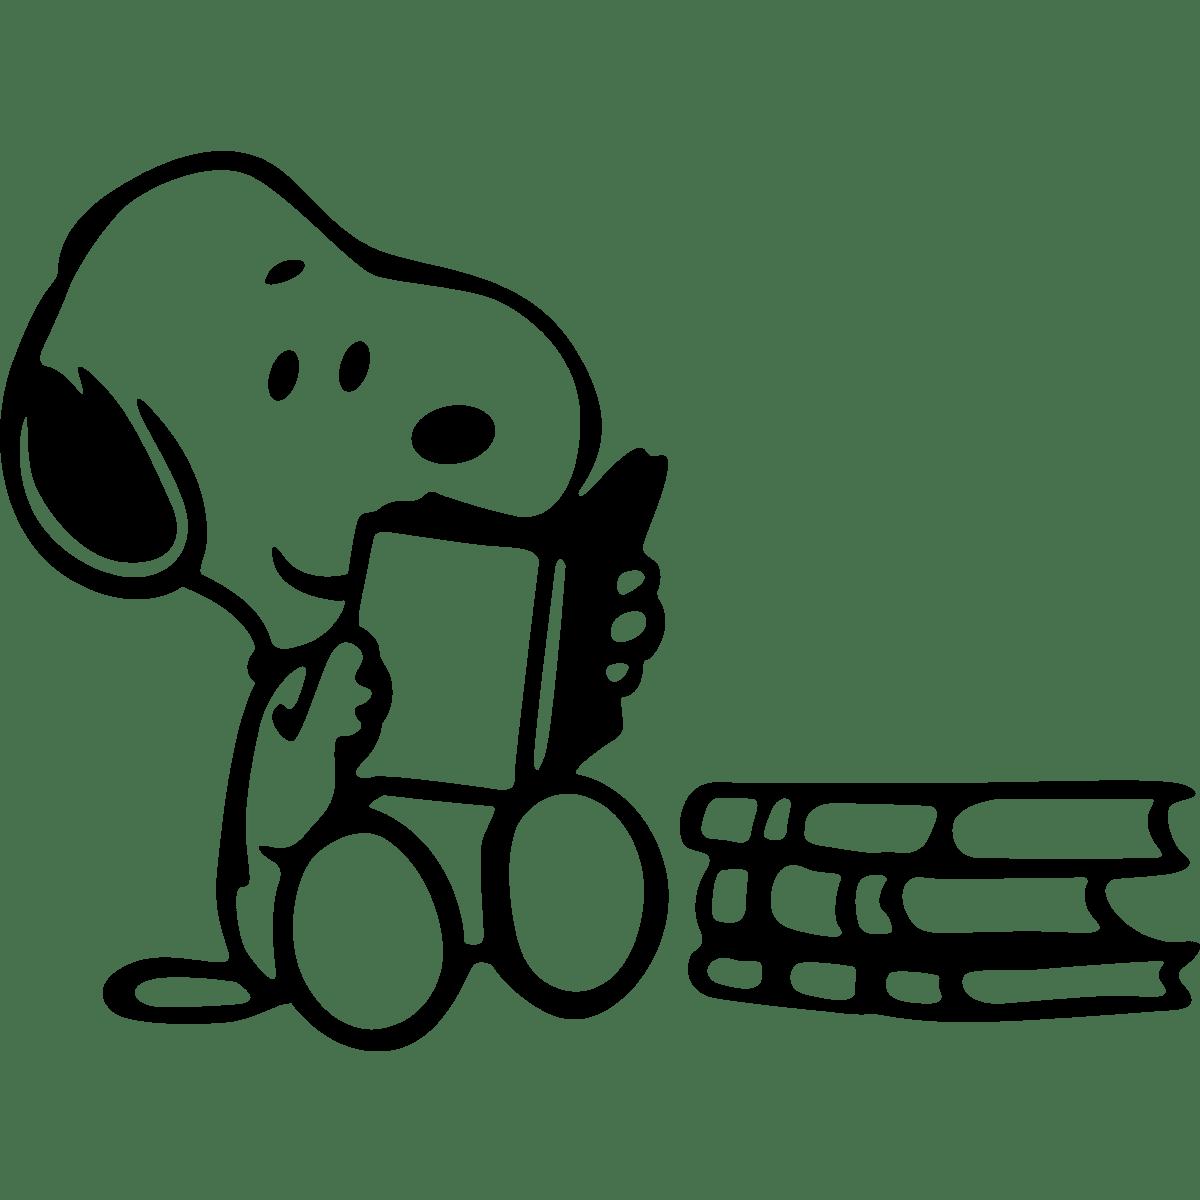 Snoopy Reading